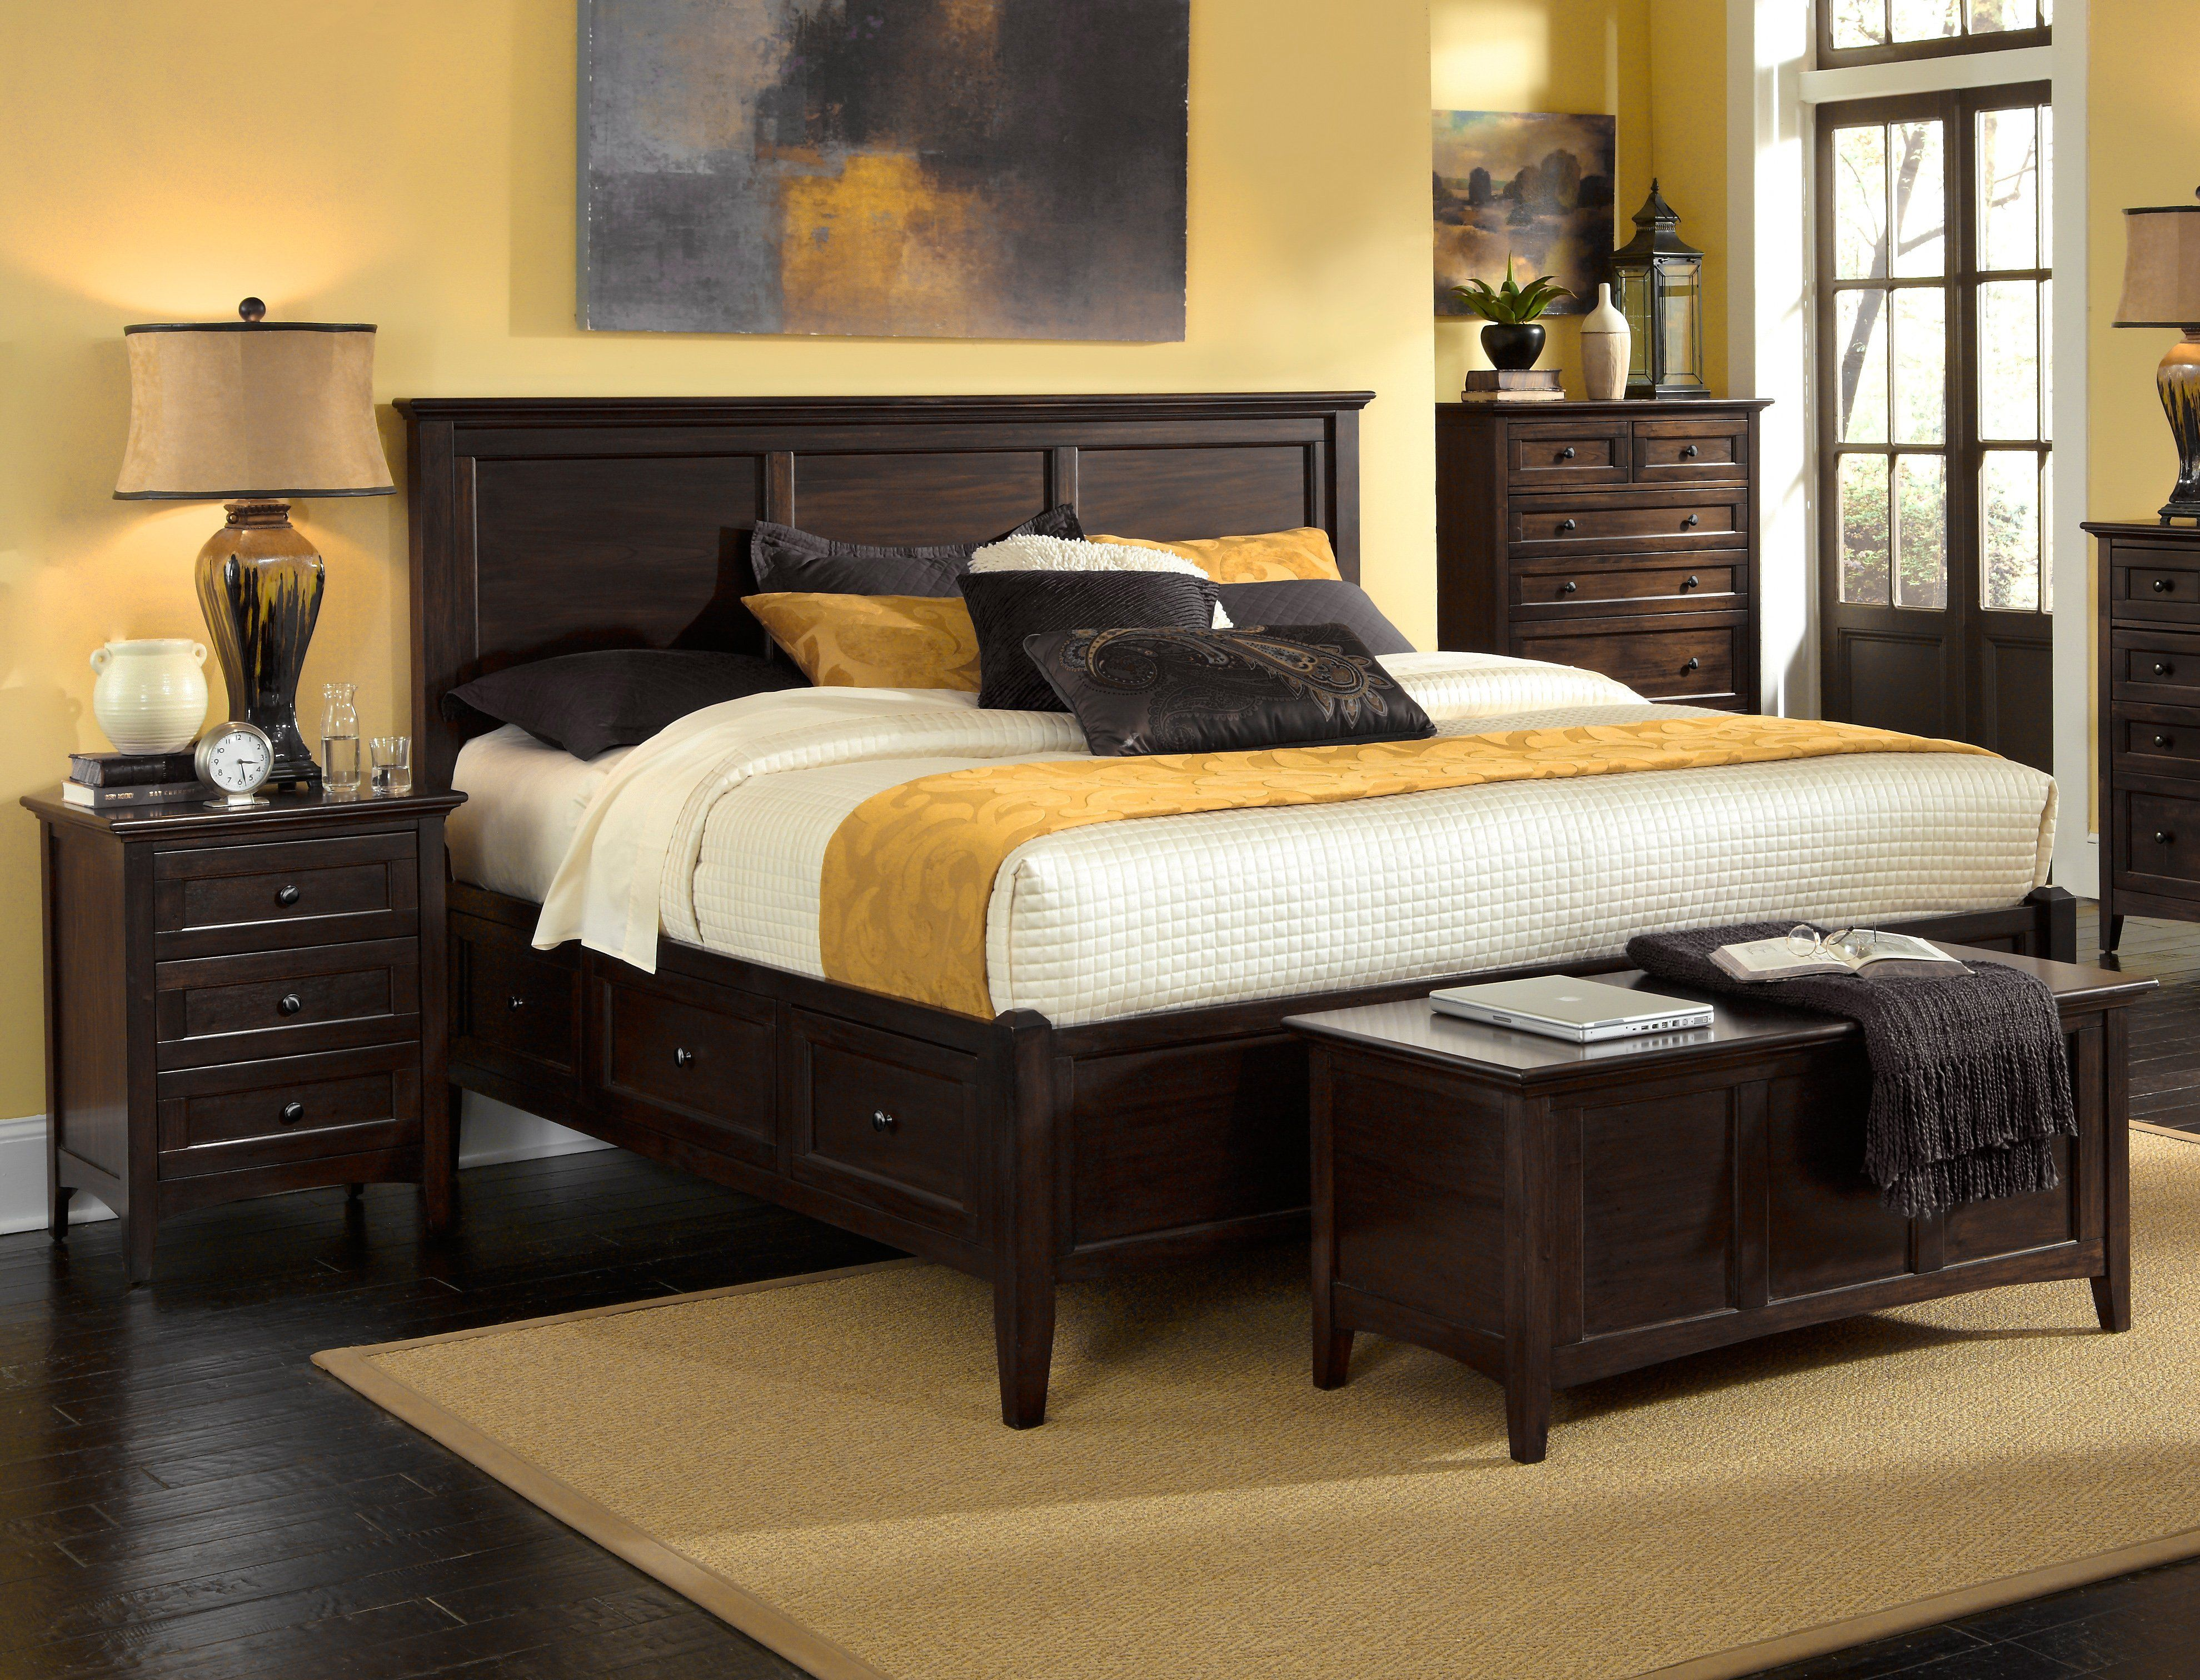 Westlake Storage Bed Bedroom sets, King storage bed